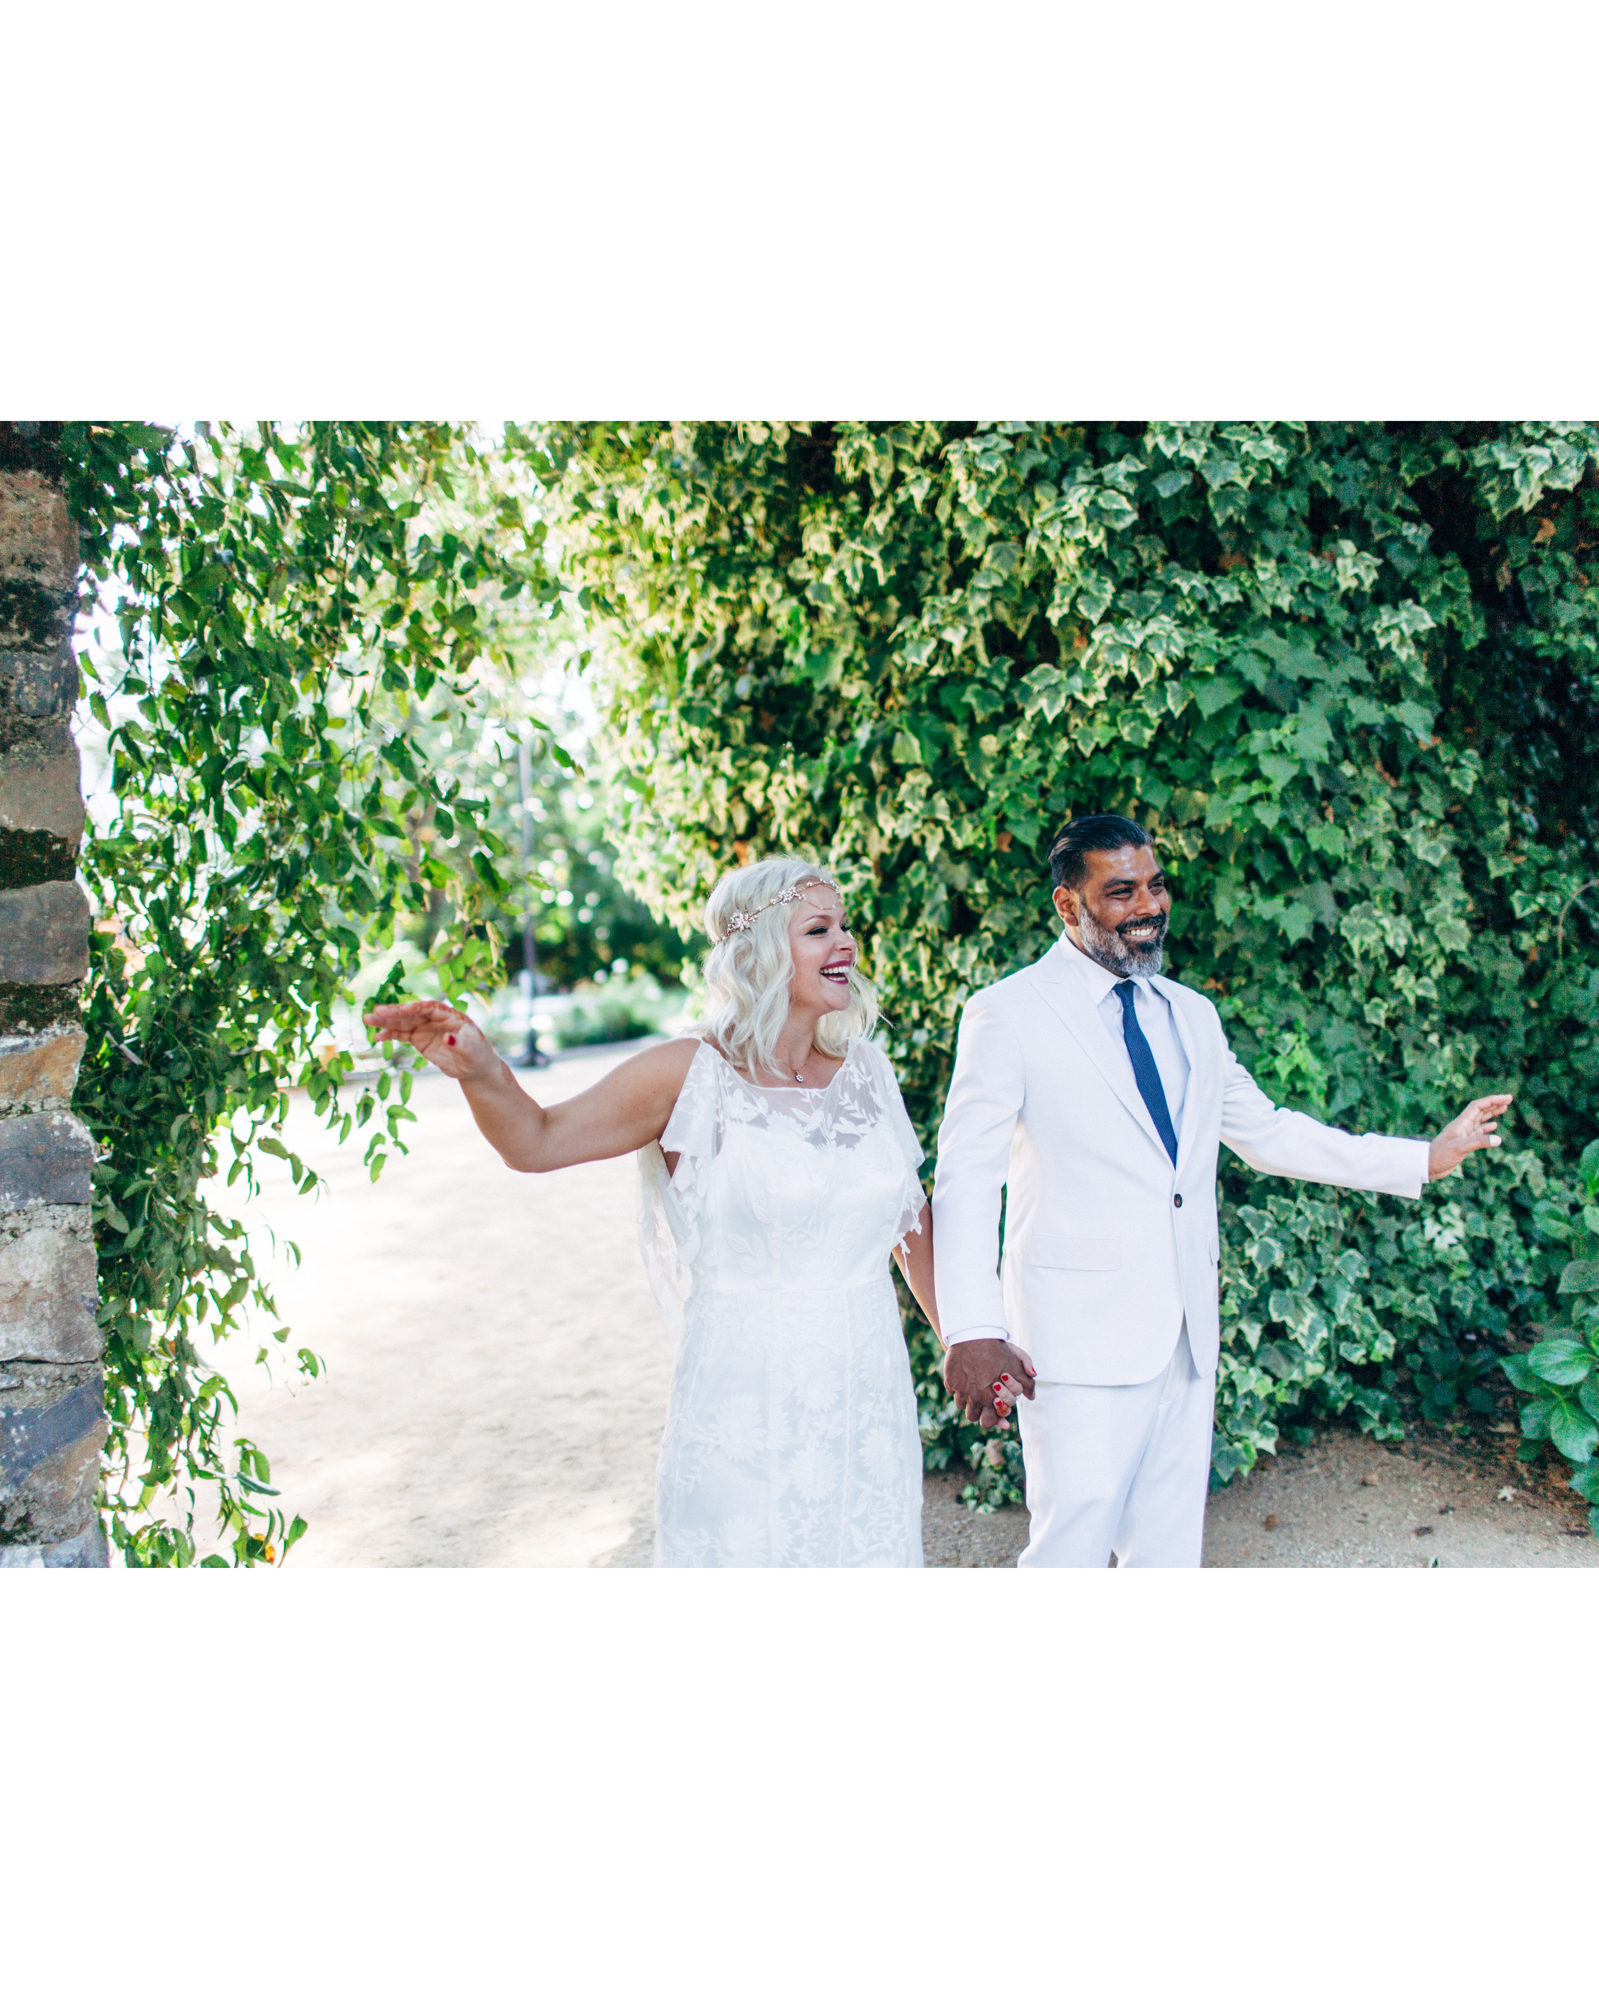 rosie-ambi-wedding-entrance-3163-s112501-0116.jpg